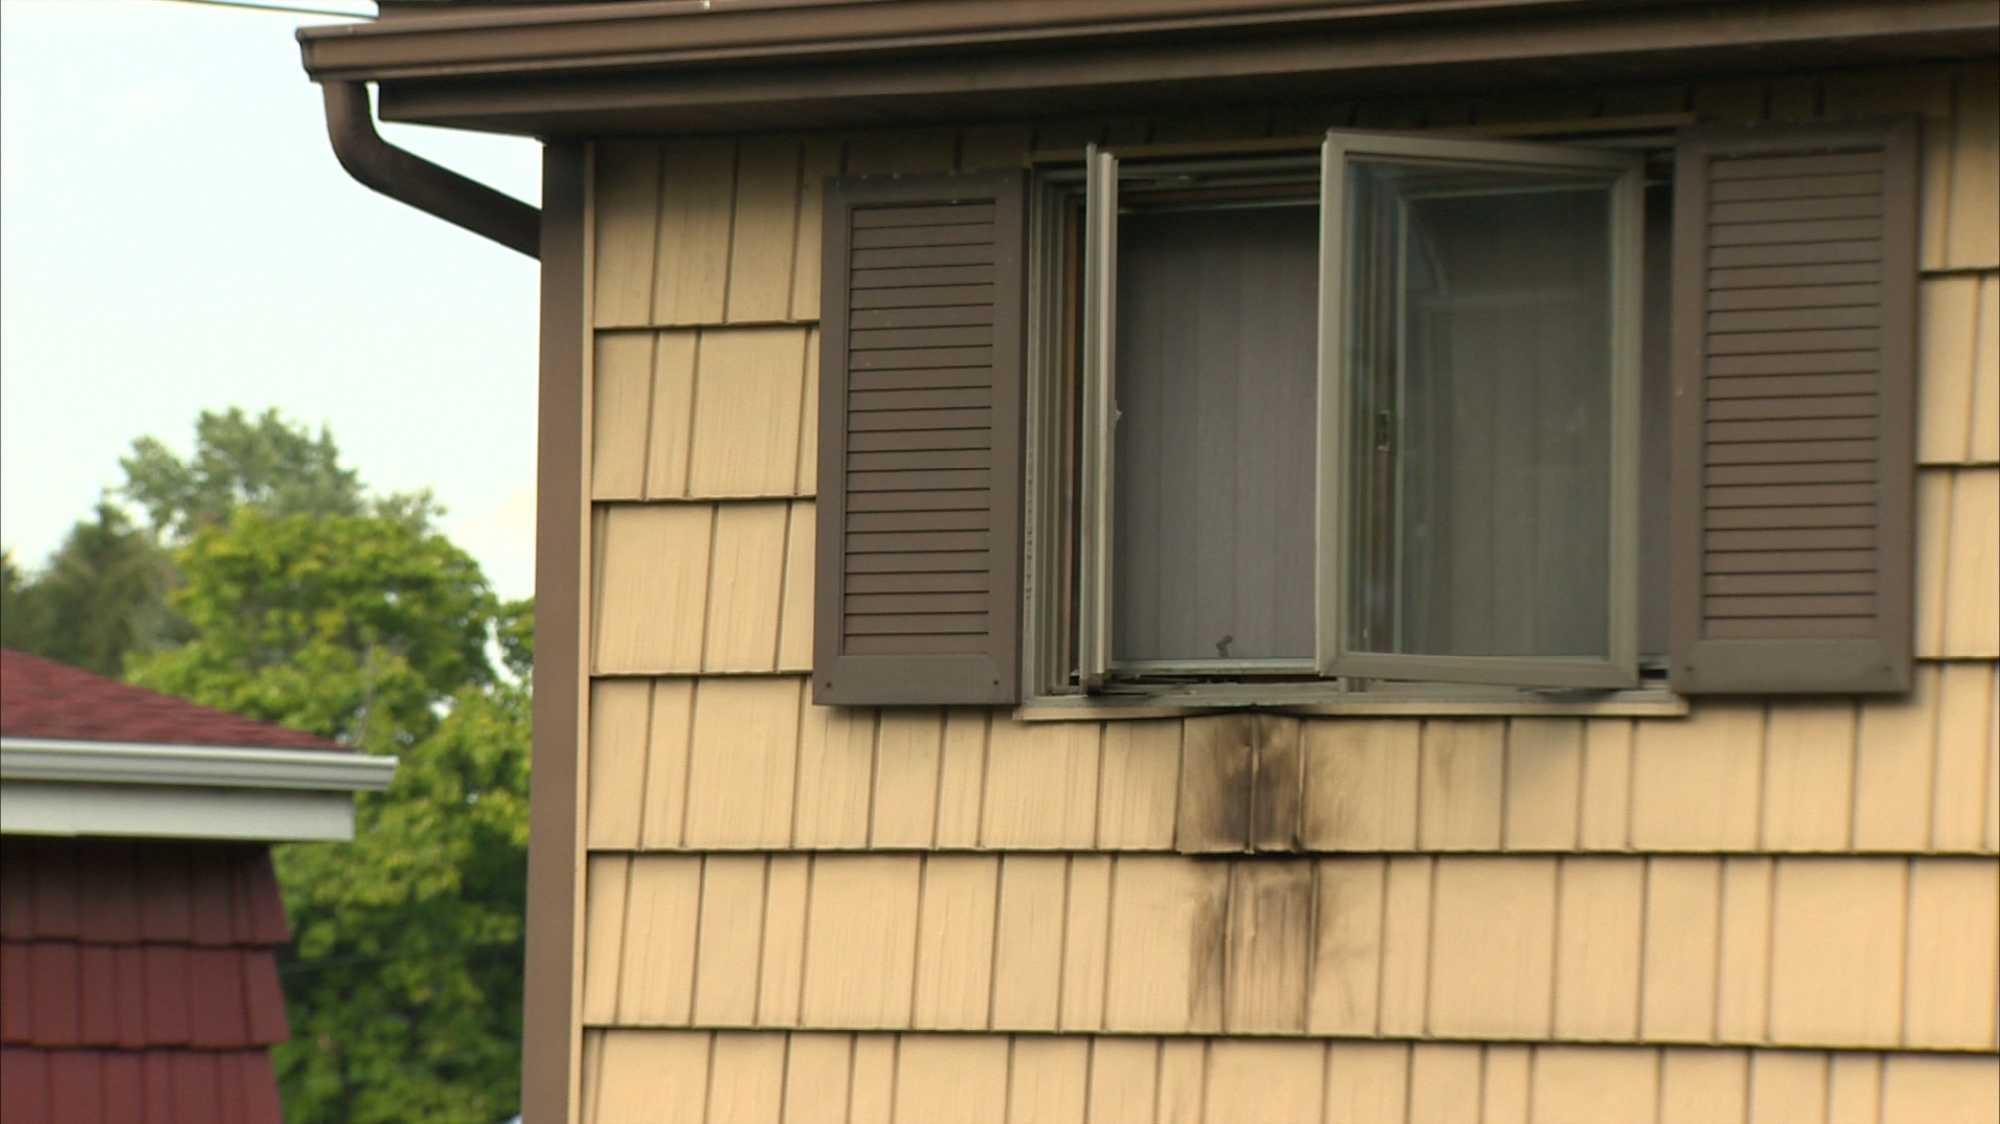 West Mifflin firebombing house window